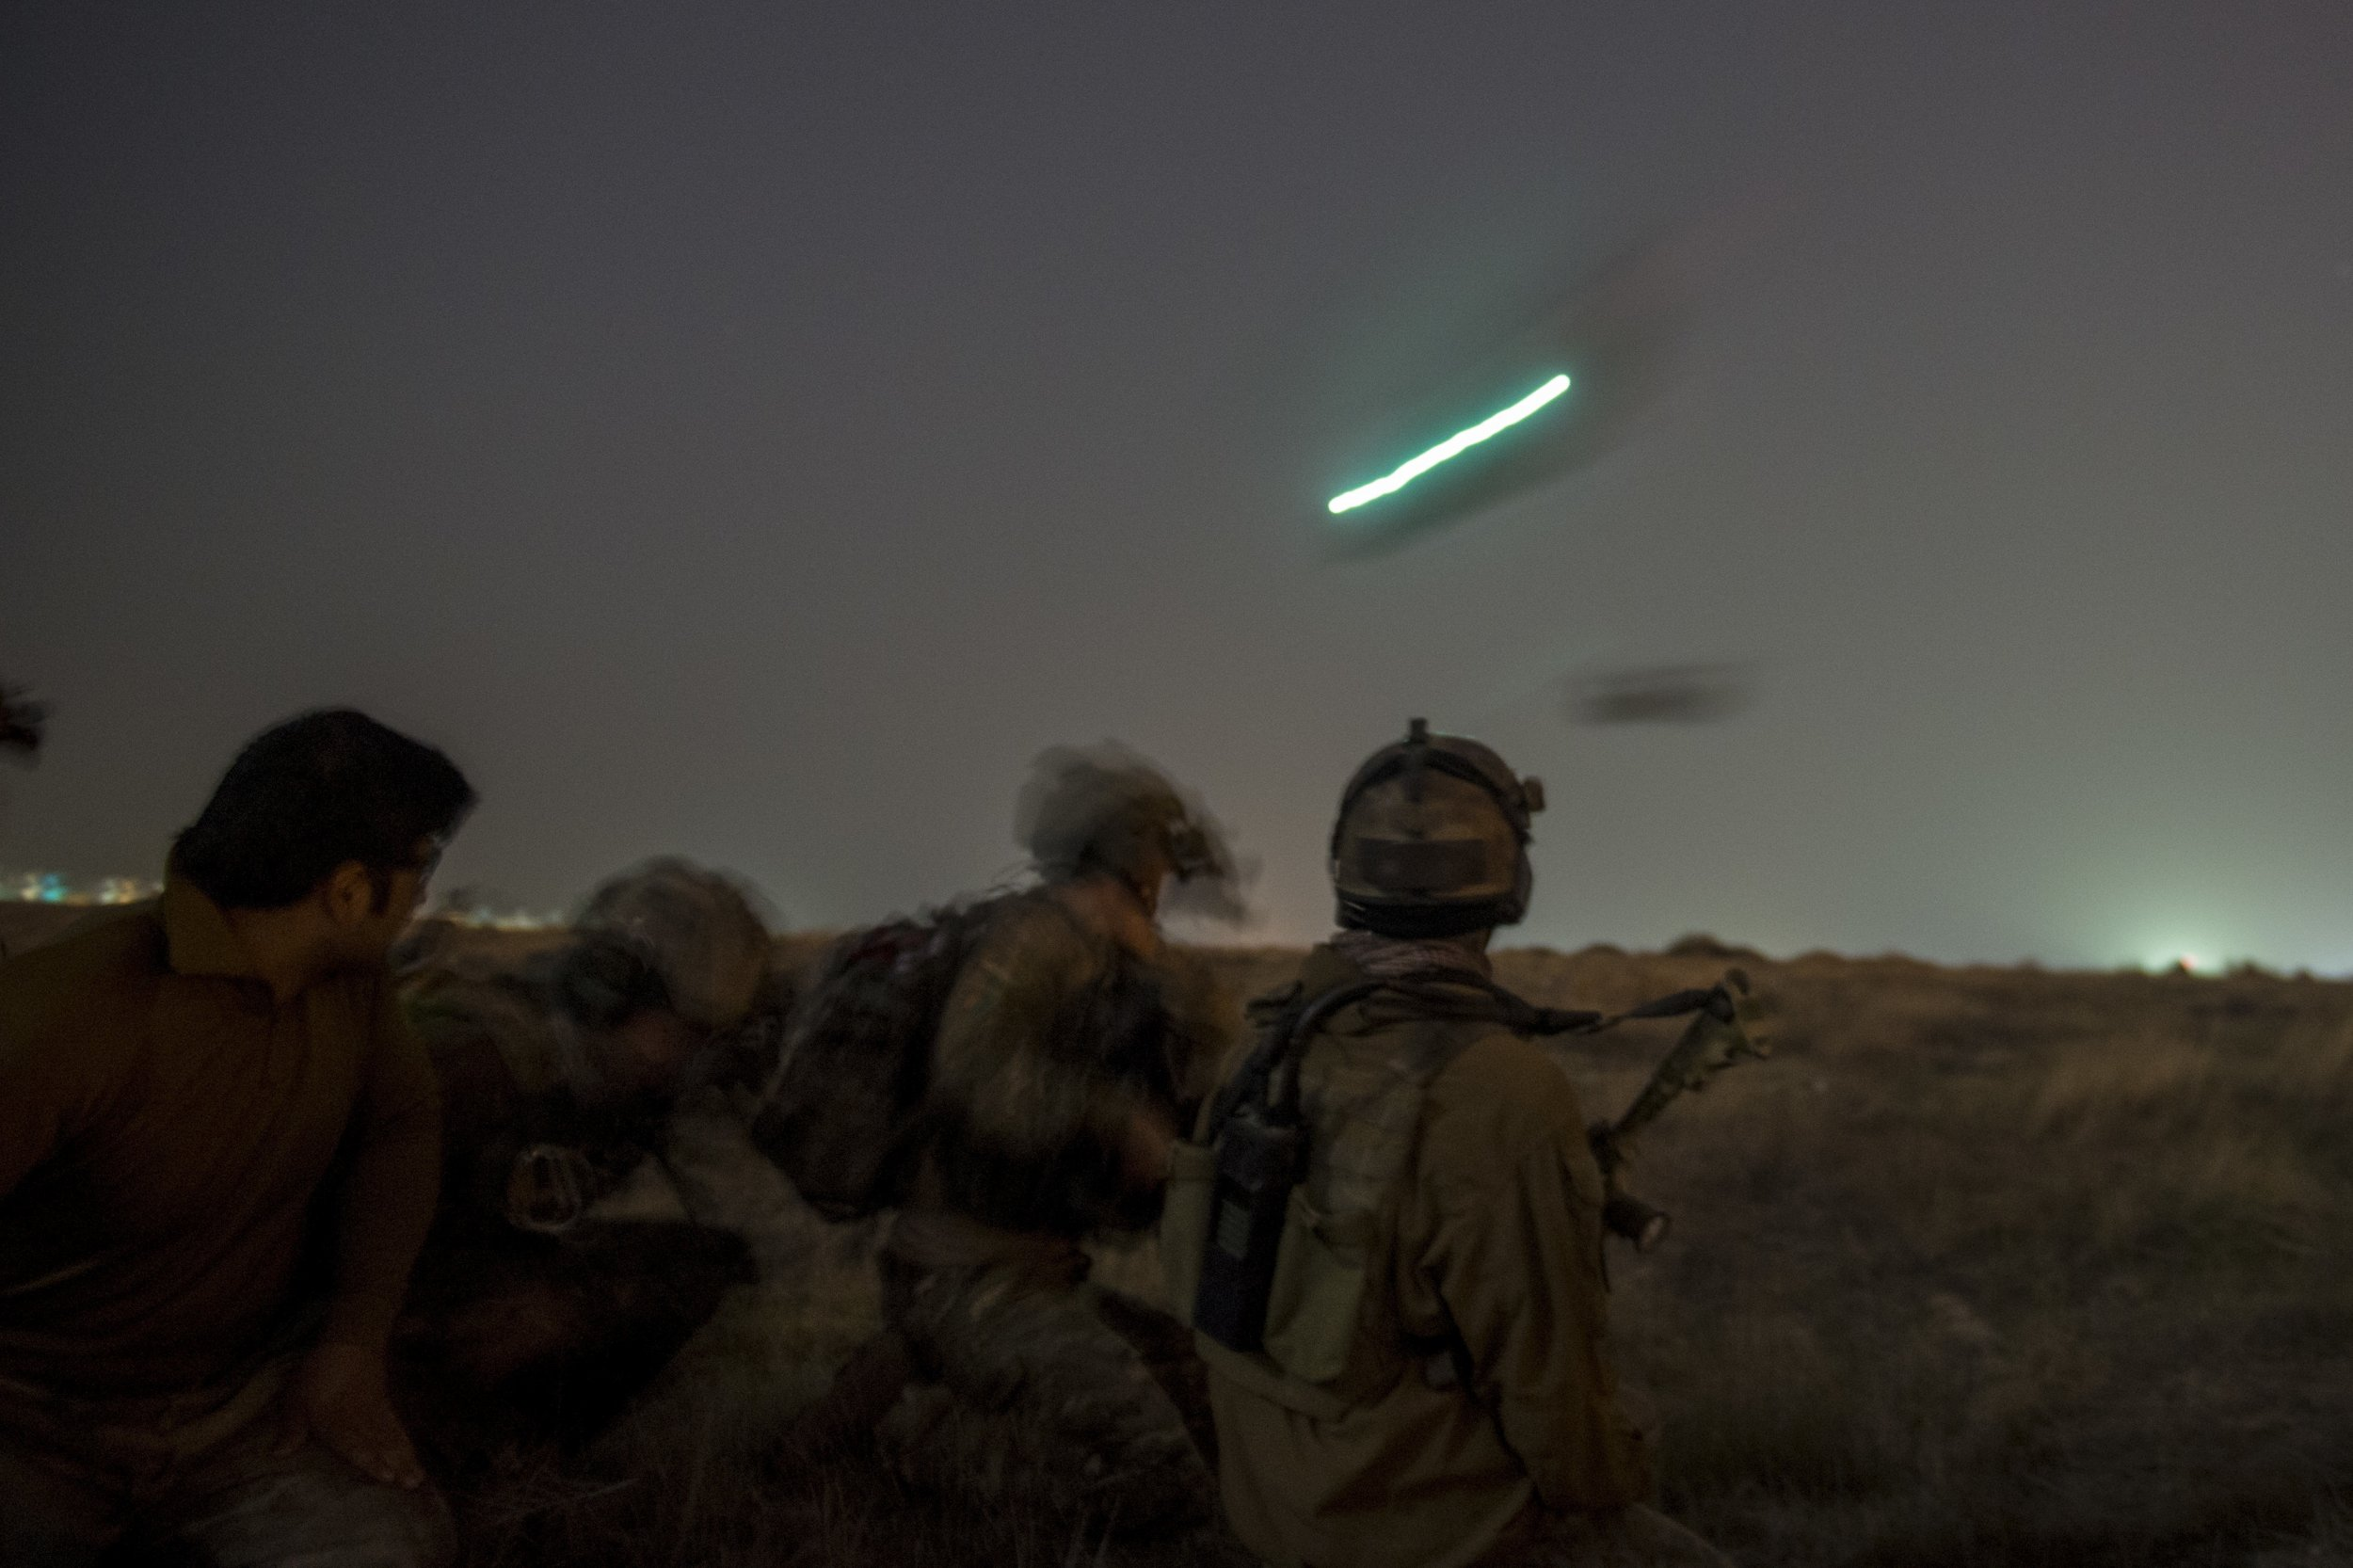 Combat Obscura Trailer - Cover Letter Resume Ideas